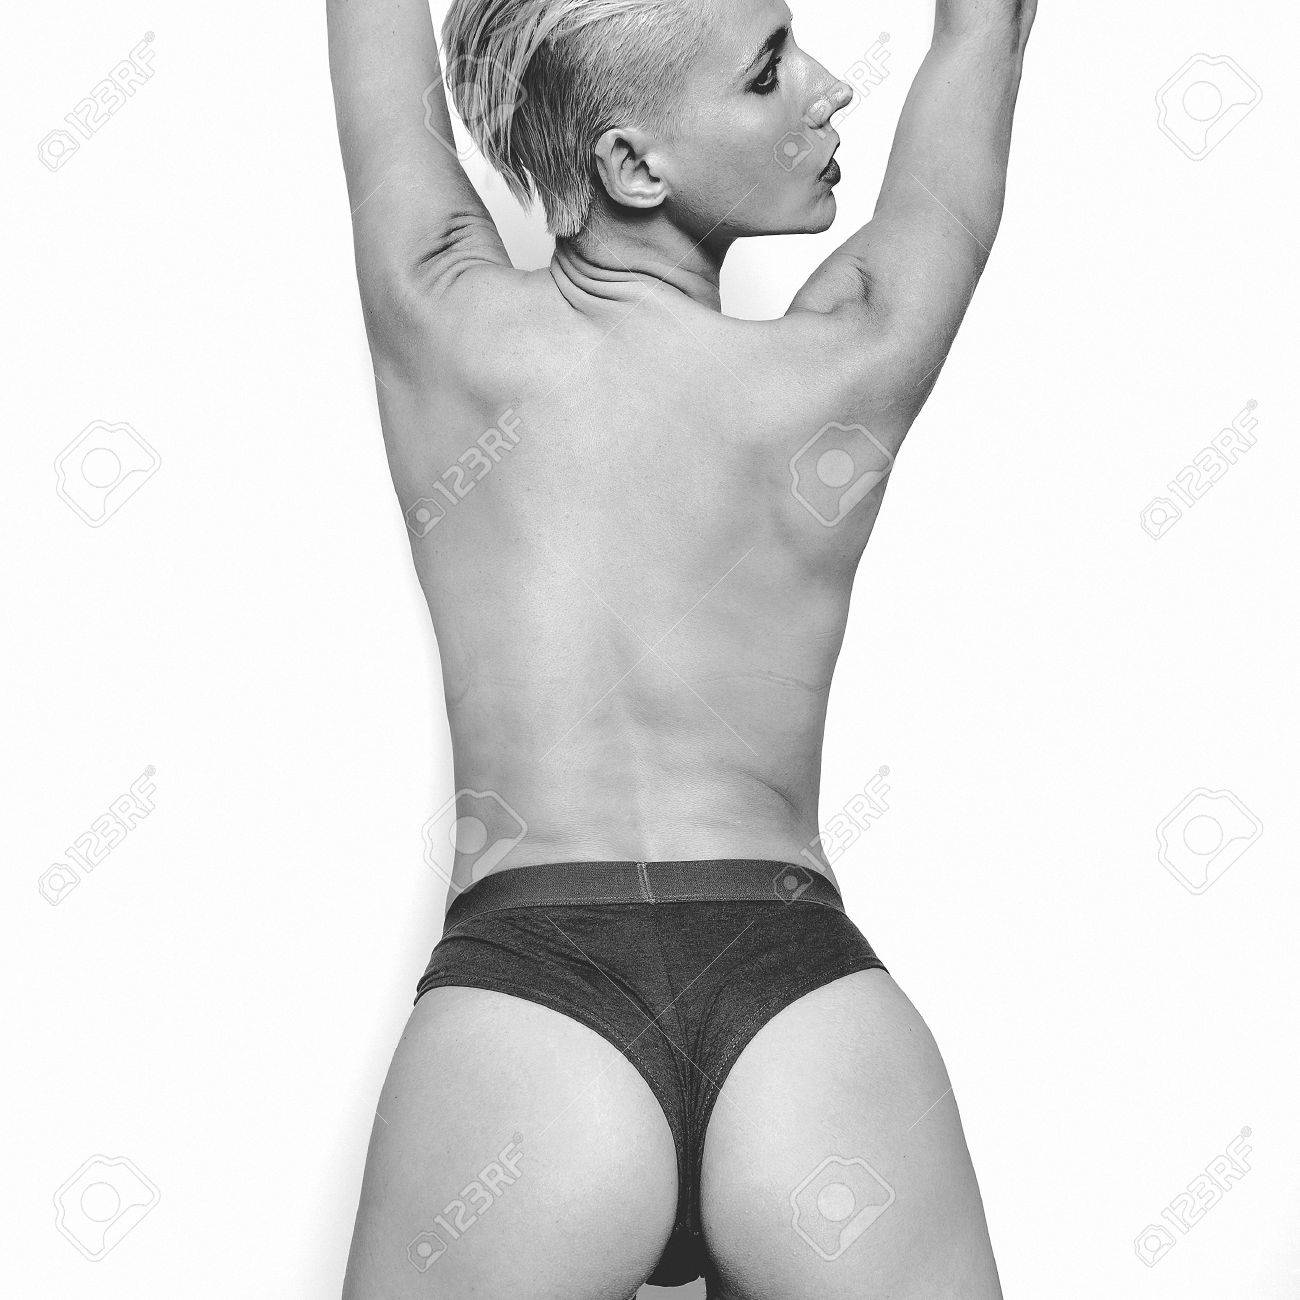 Sensual Girl Ass Sex Relationship Psychology Stock Photo 74243659